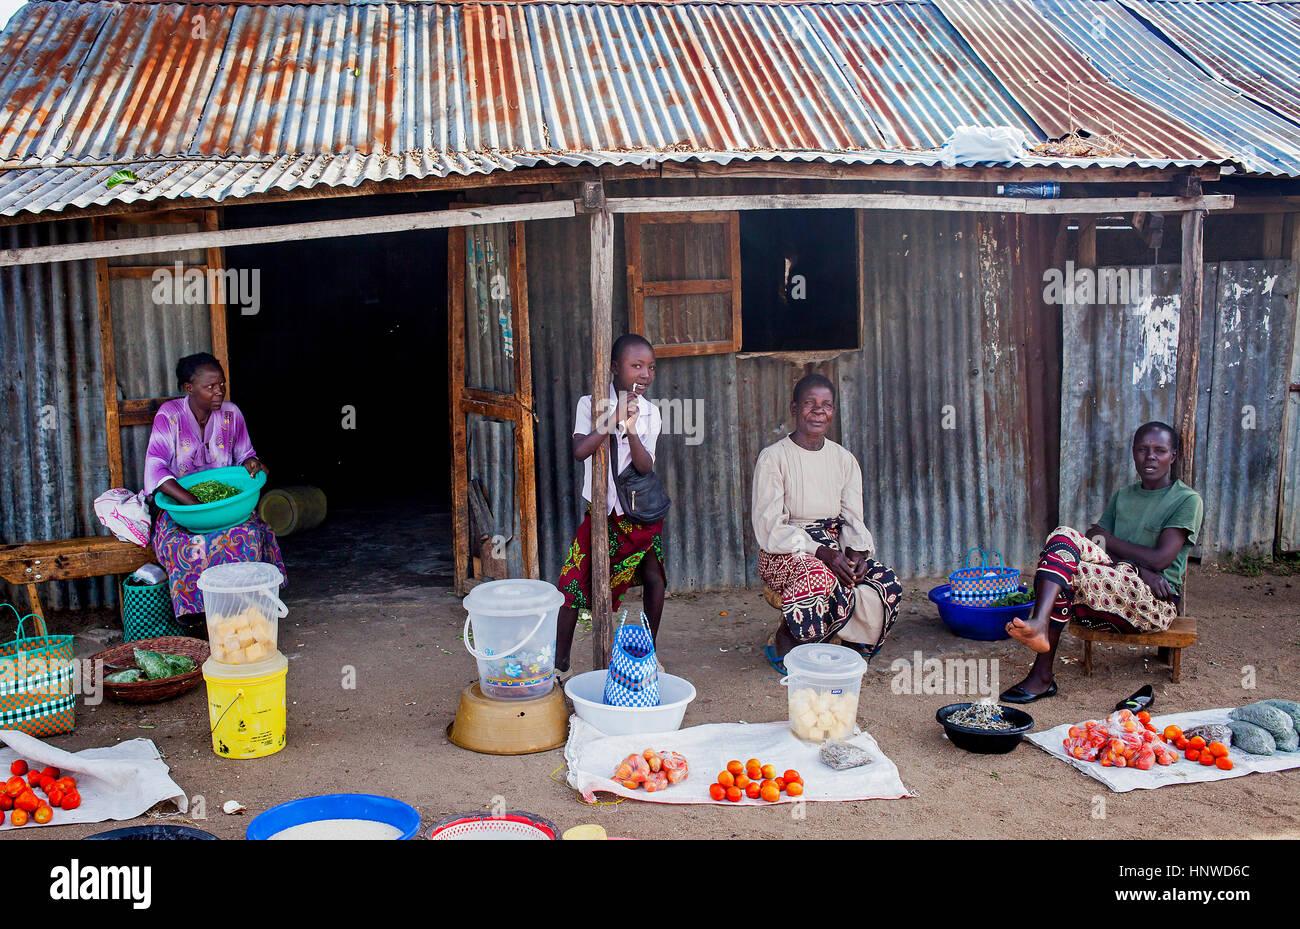 Greengrocery, in the fishing village of Kolunga, Rusinga Island, Lake Victoria, Kenya, Africa - Stock Image